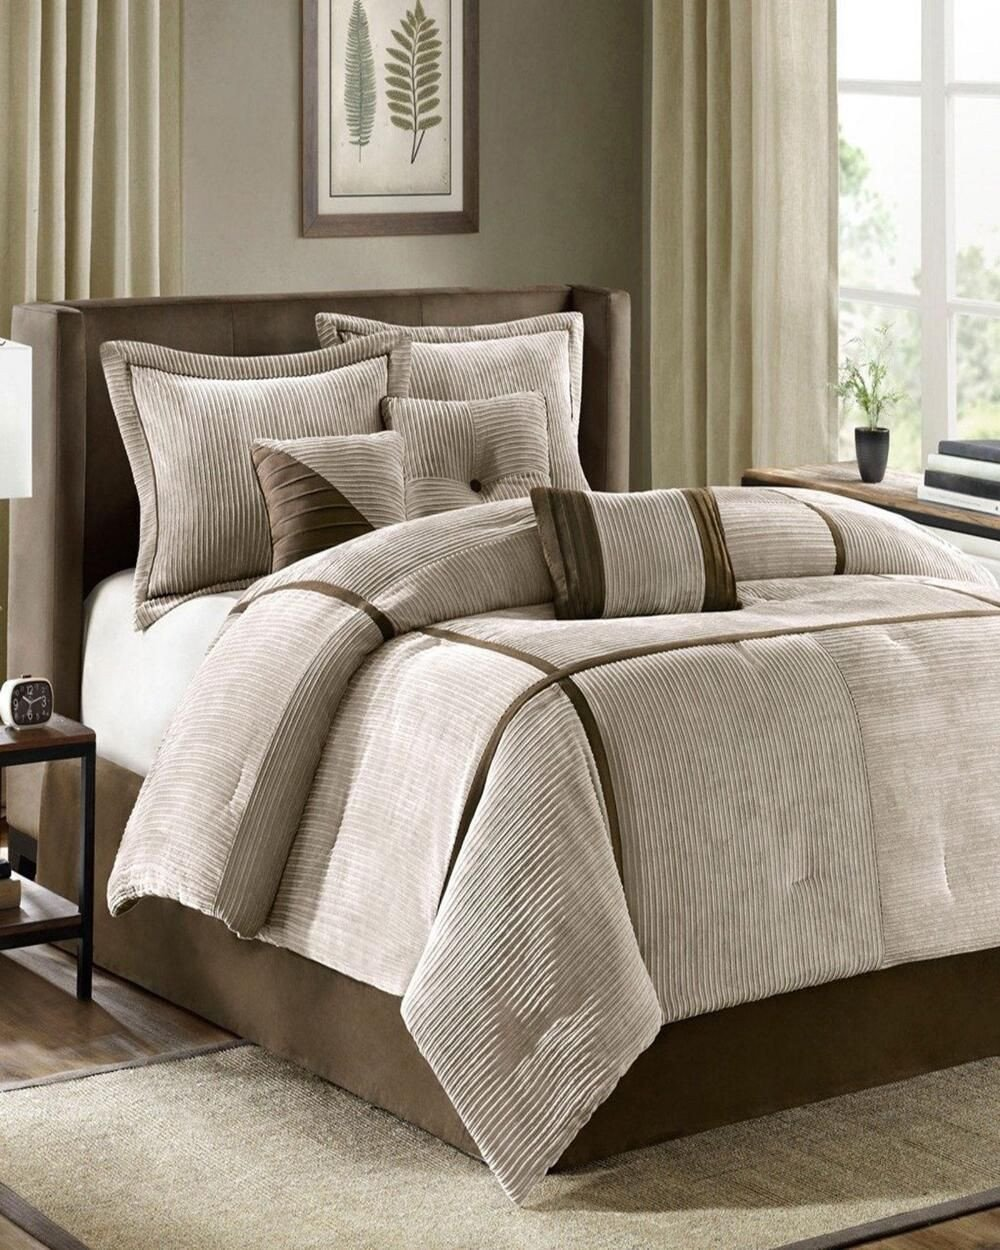 Cheap Bedroom Comforter Set Inspirational Madison Park 7 Piece Houston forter Set